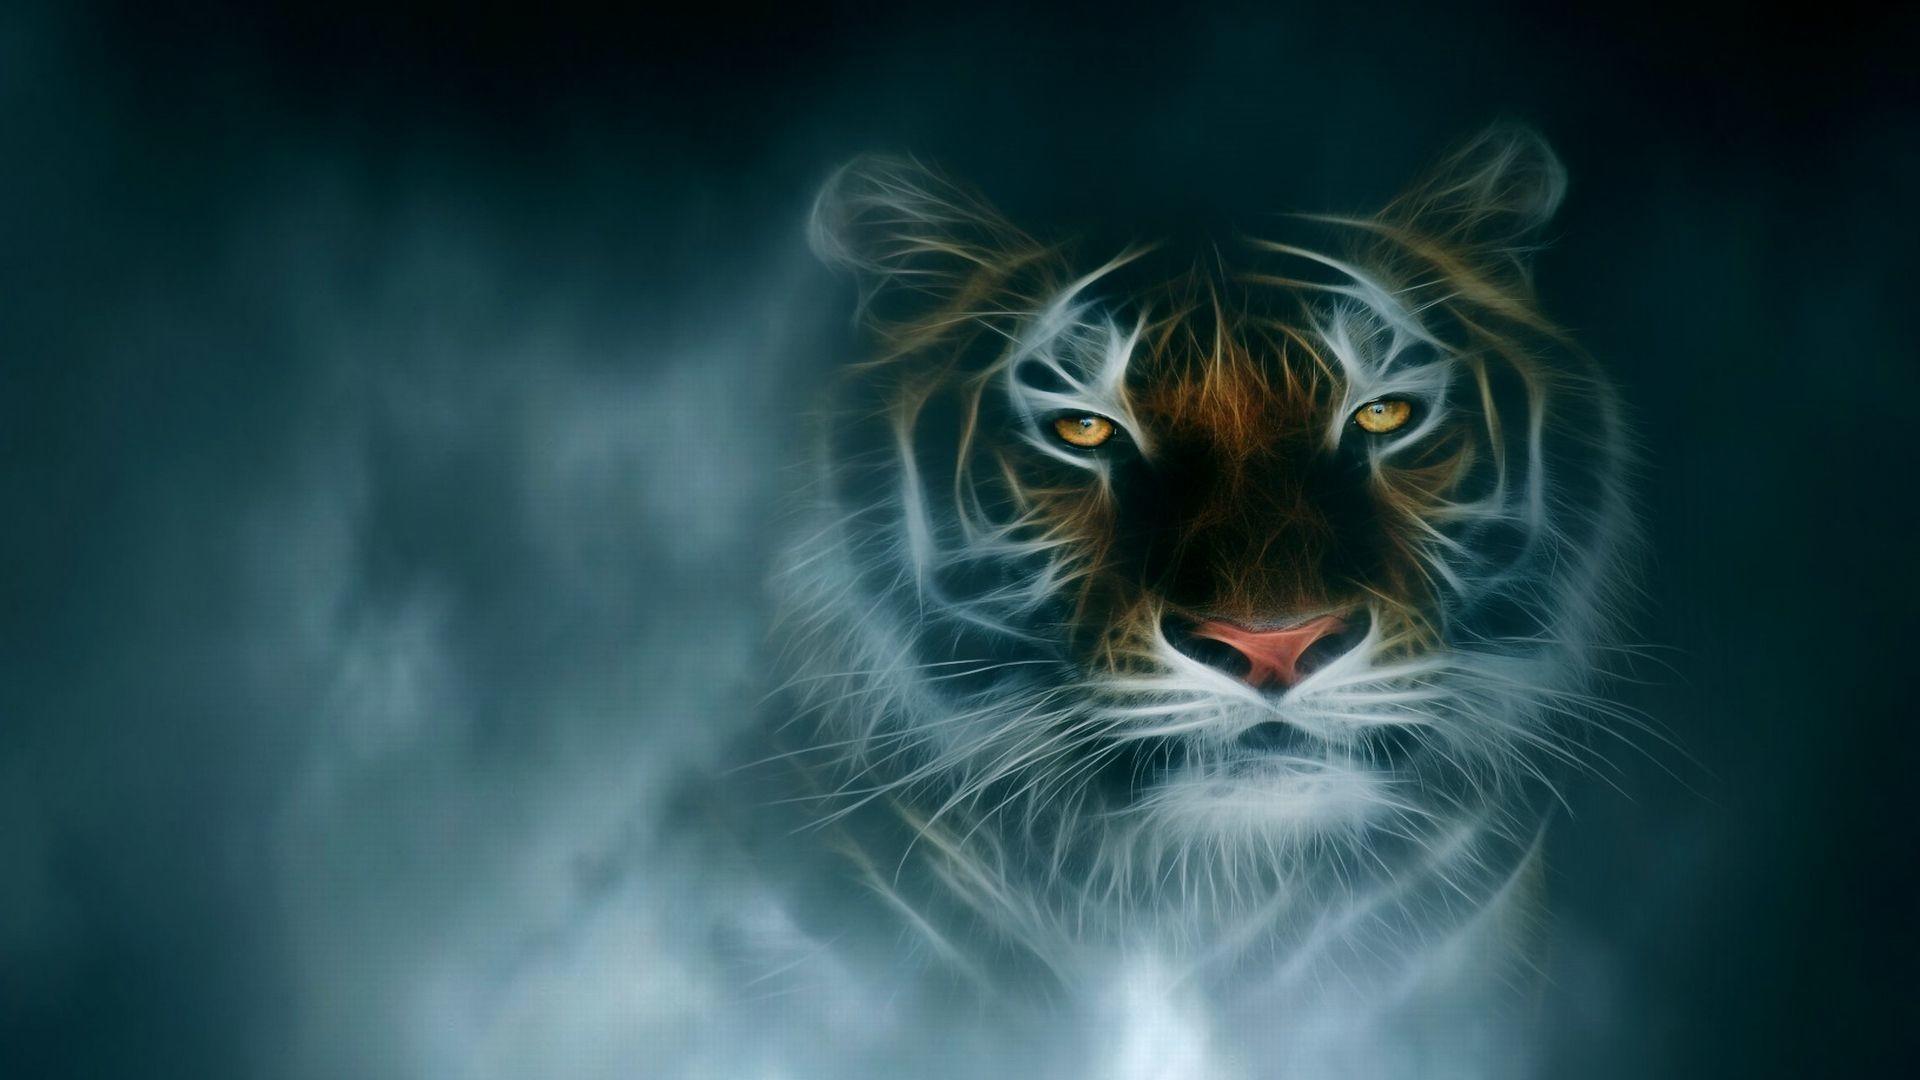 Fractal tiger – and CG Wallpaper ID 1696315 – Desktop Nexus Abstract